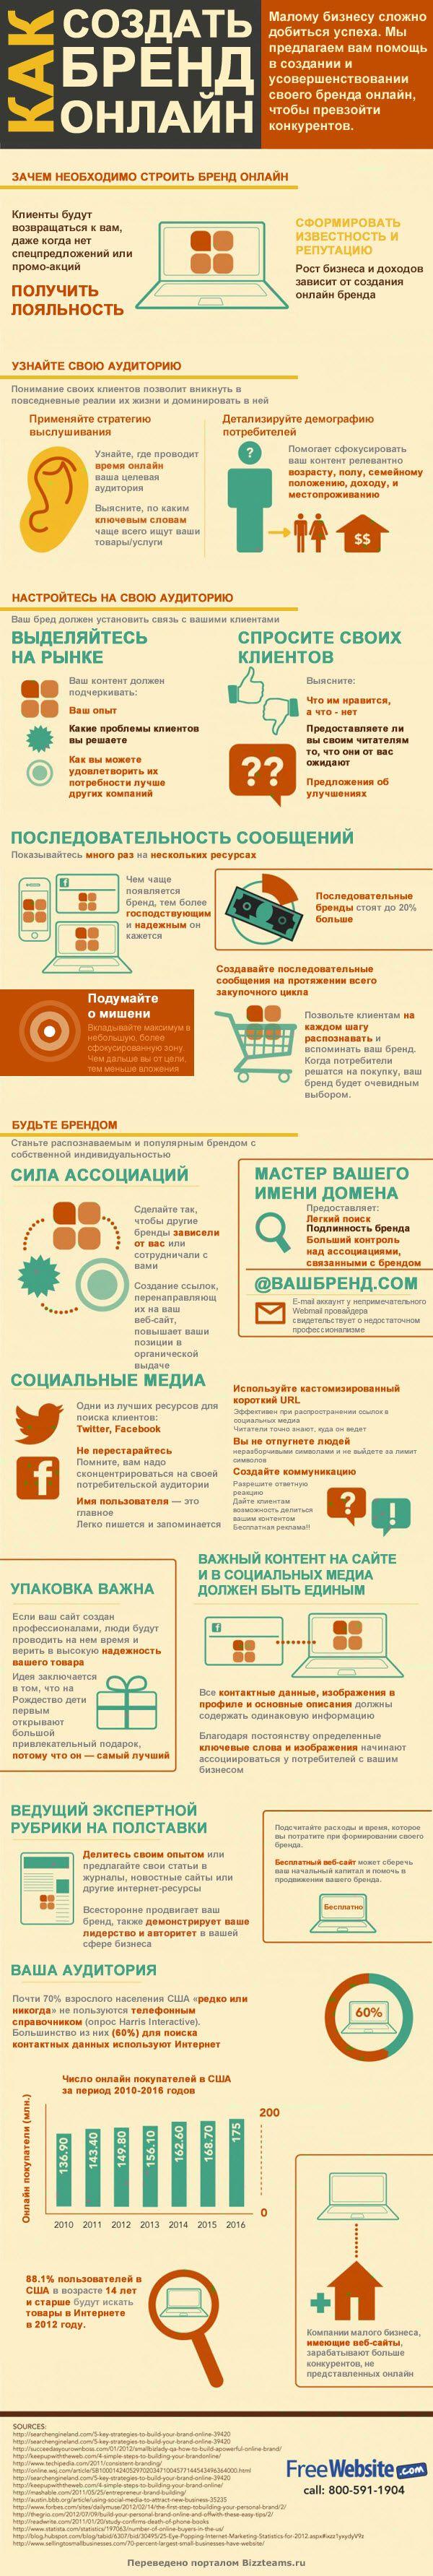 Как создать бренд онлайн